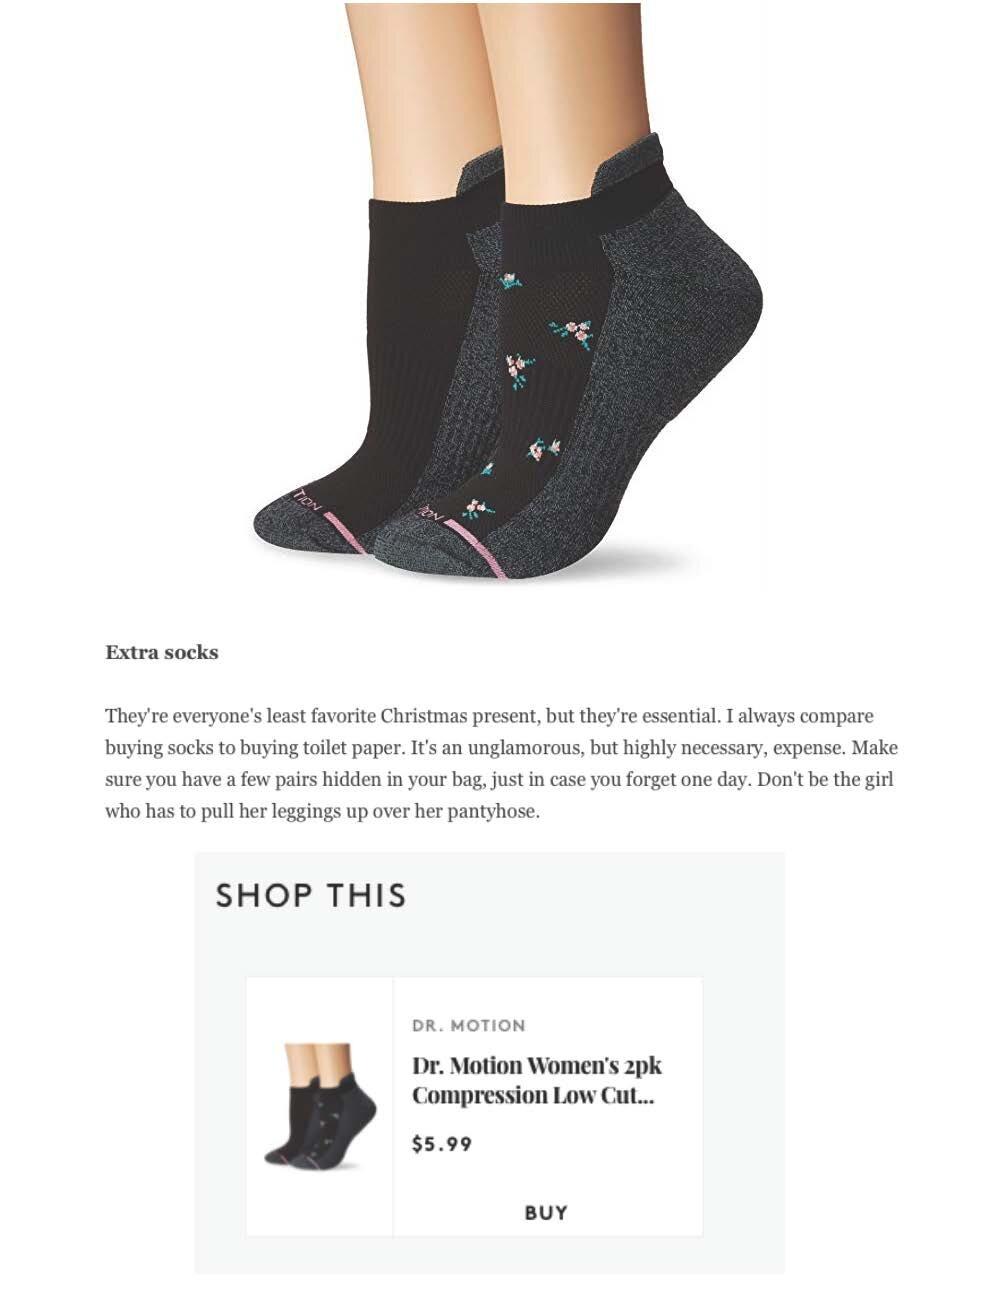 benefits of compression socks